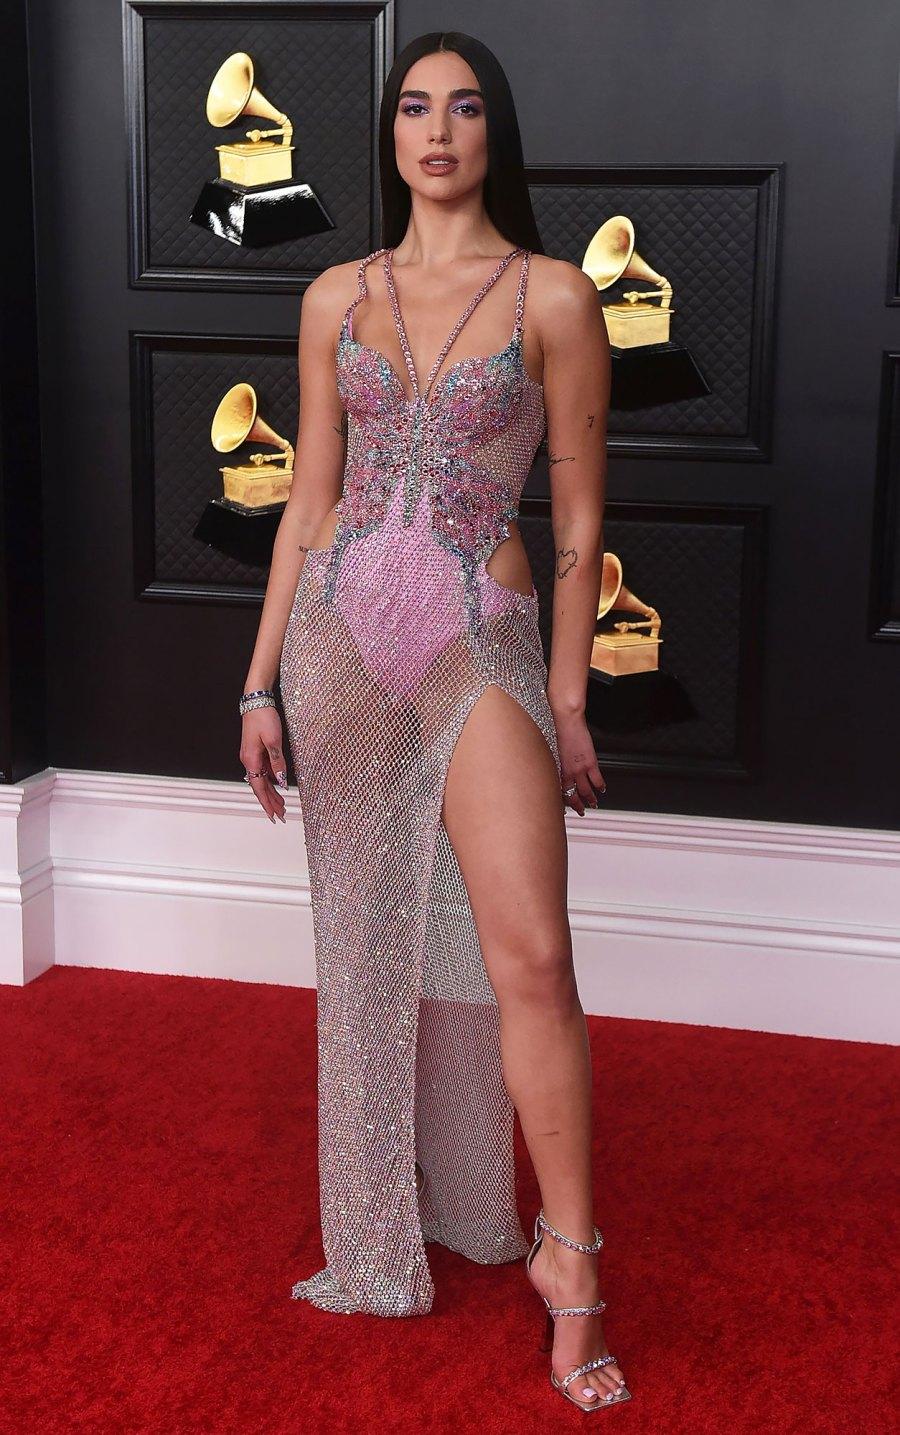 2021 Grammy Awards Red Carpet Arrivals - Dua Lipa